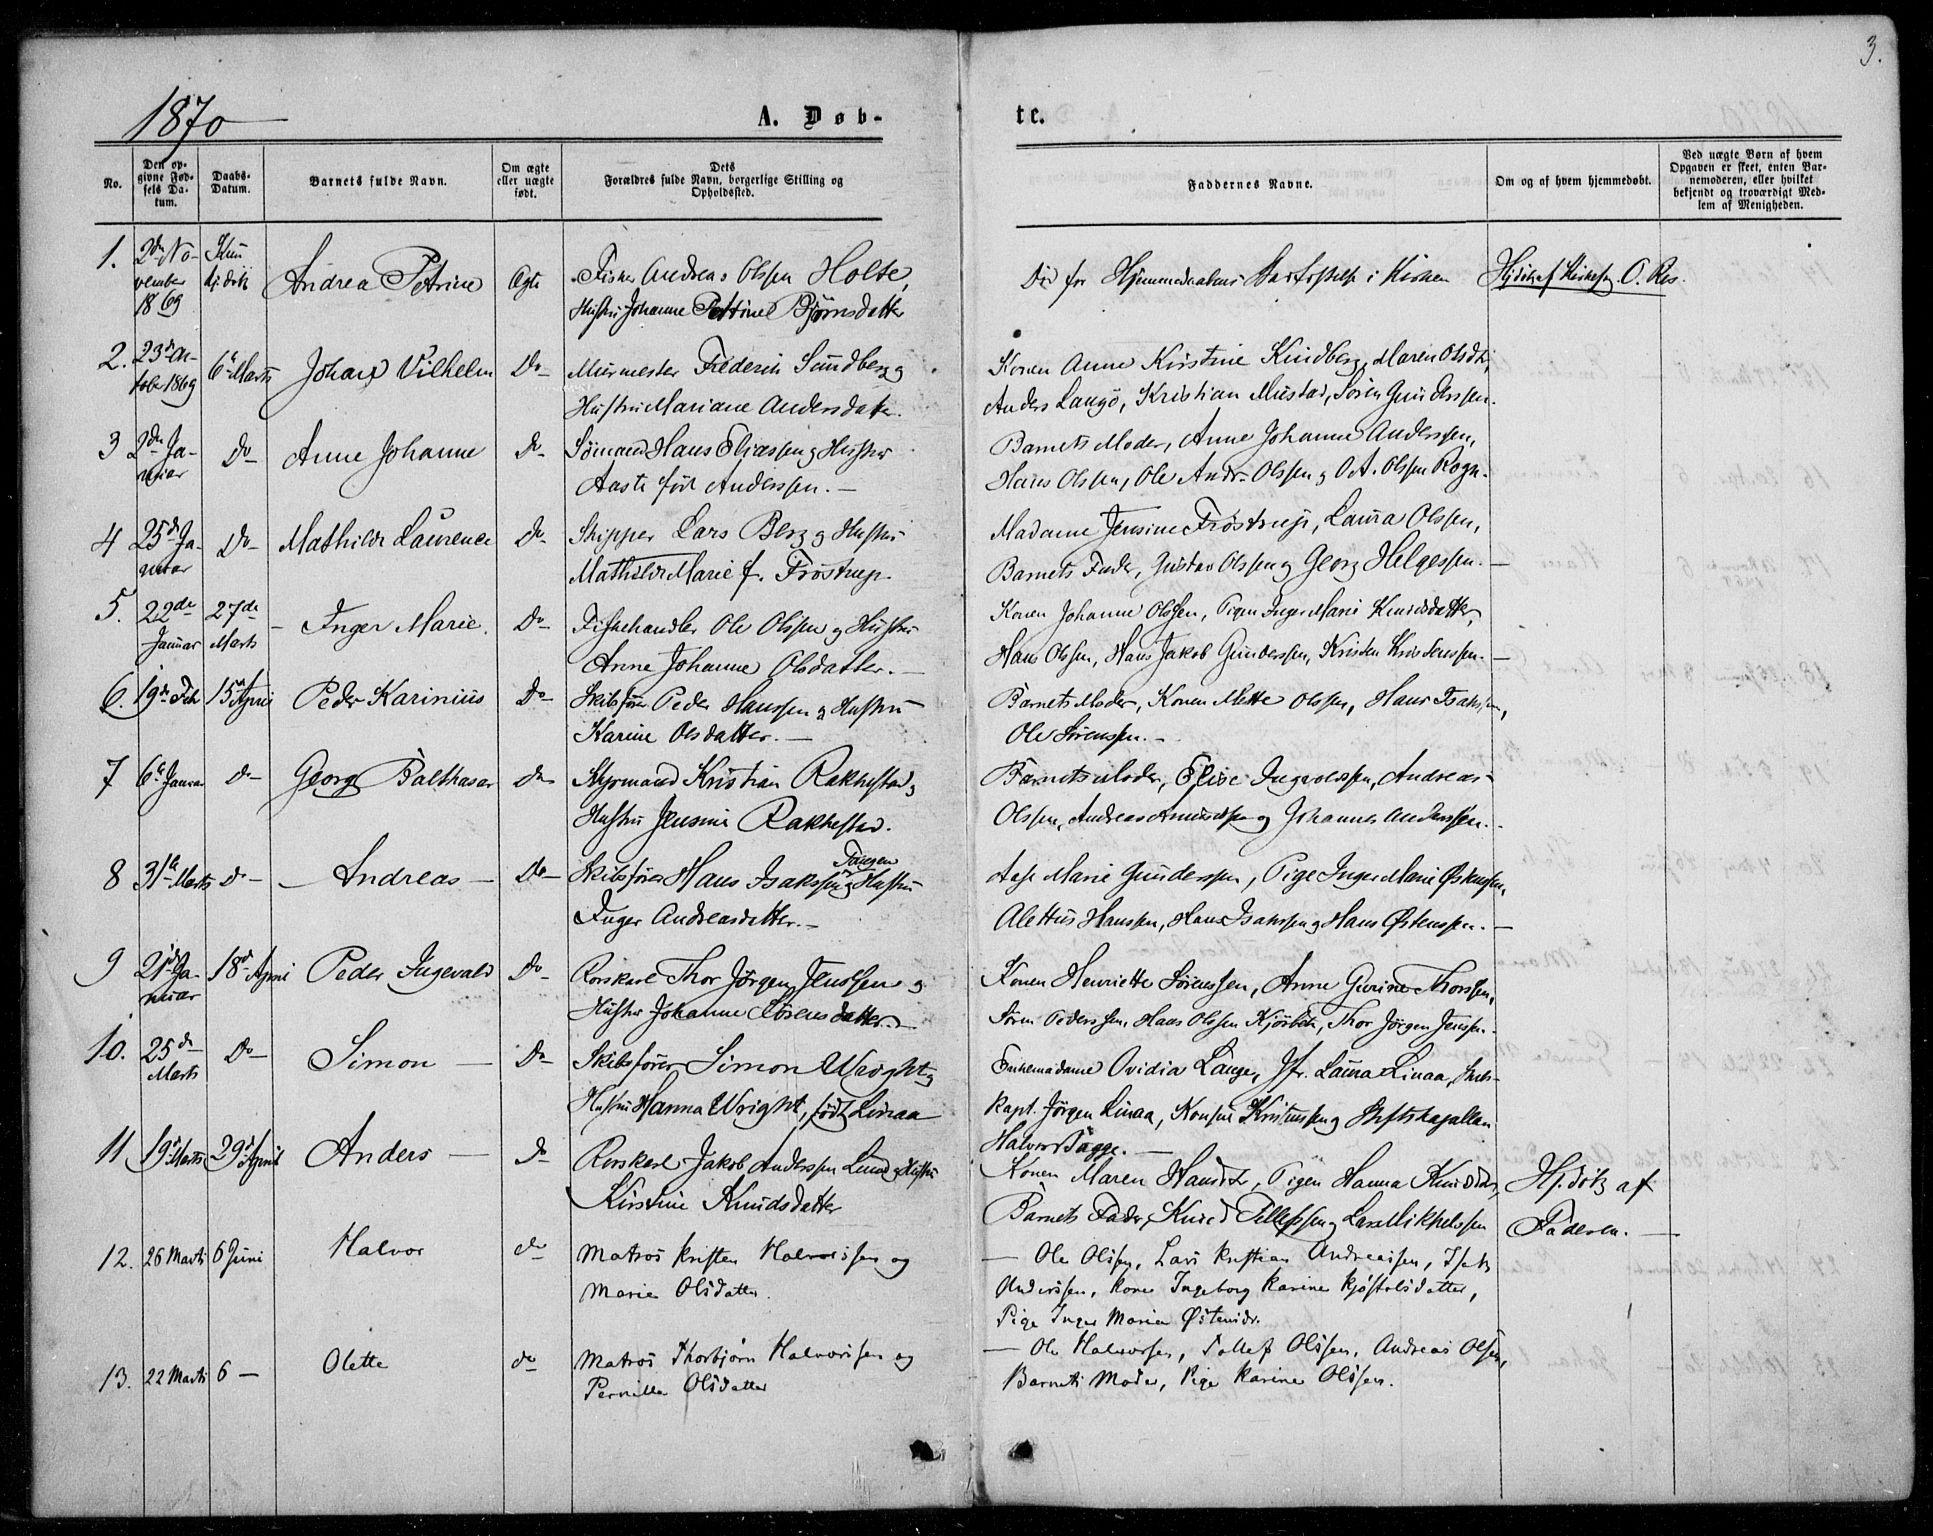 SAKO, Langesund kirkebøker, F/Fa/L0001: Ministerialbok nr. 1, 1870-1877, s. 3